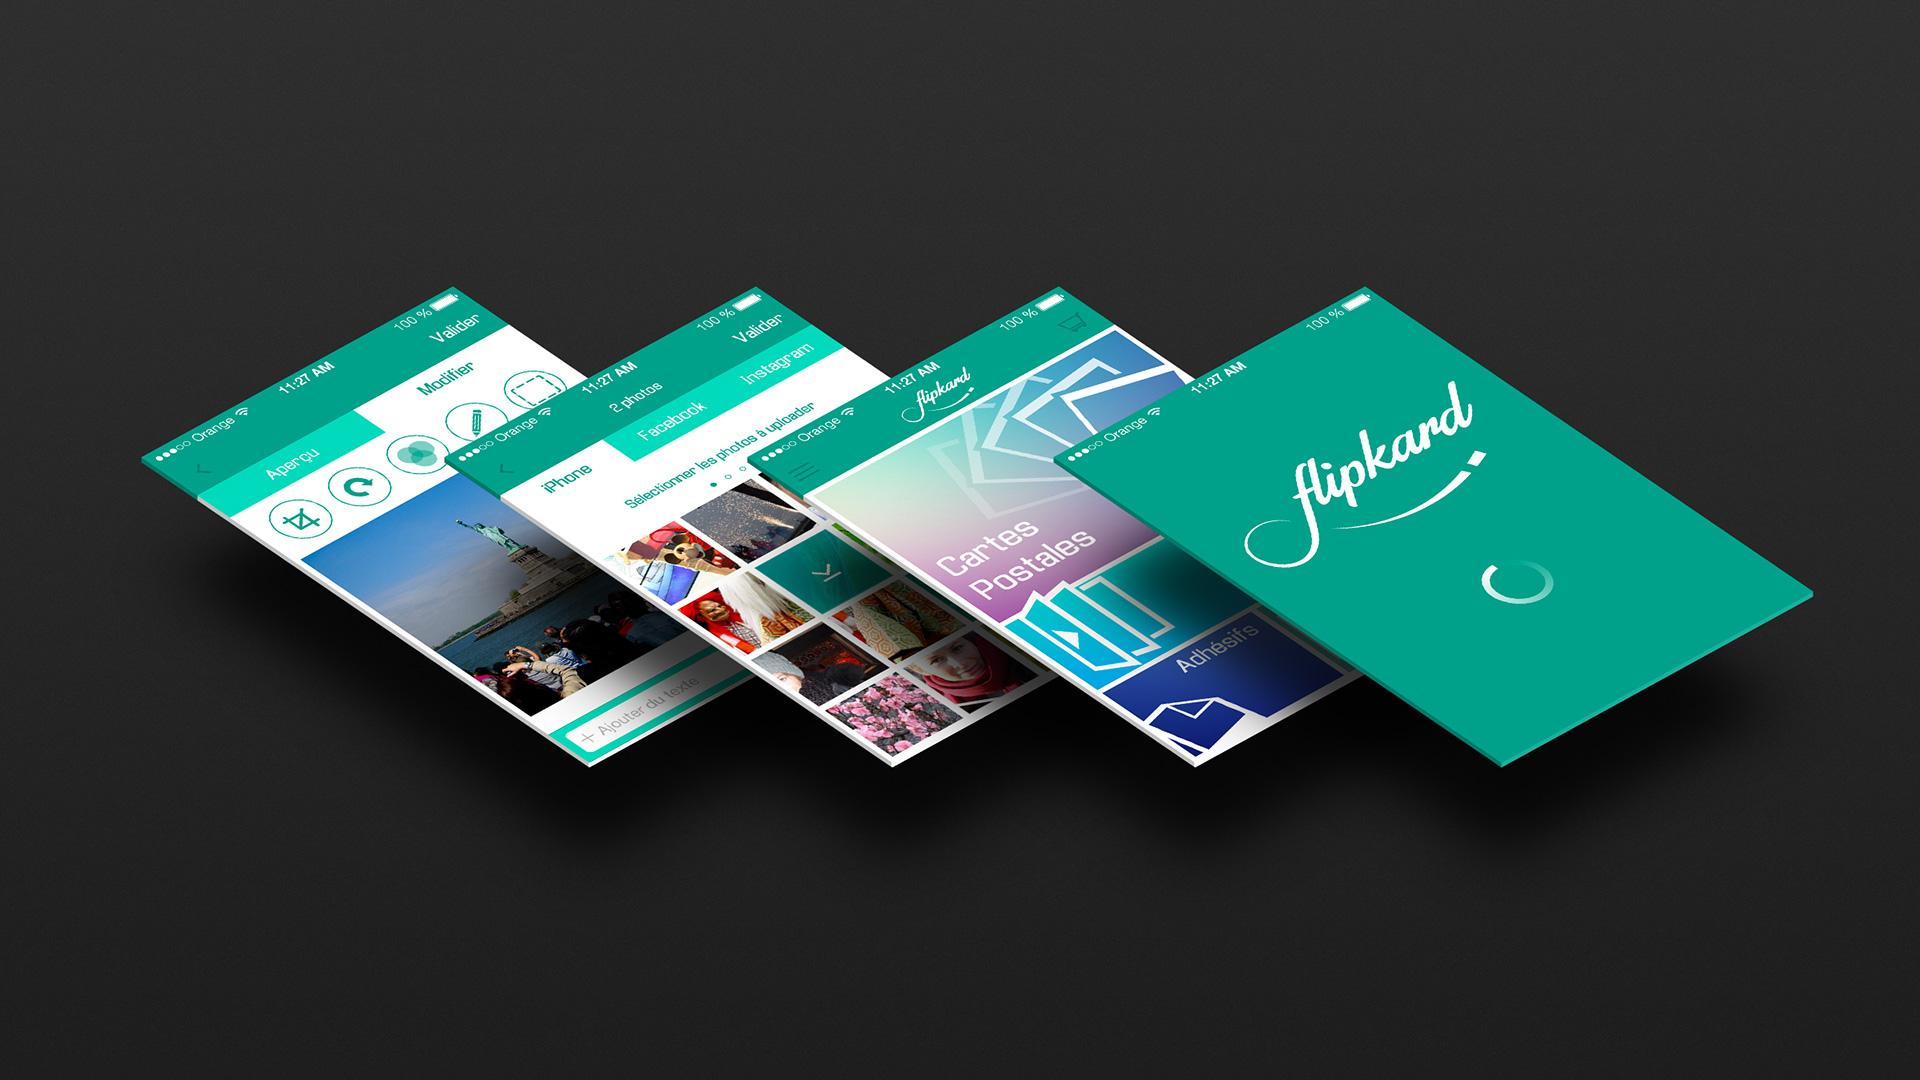 02_florian_branchet_designer_graphique_flipkard_screens